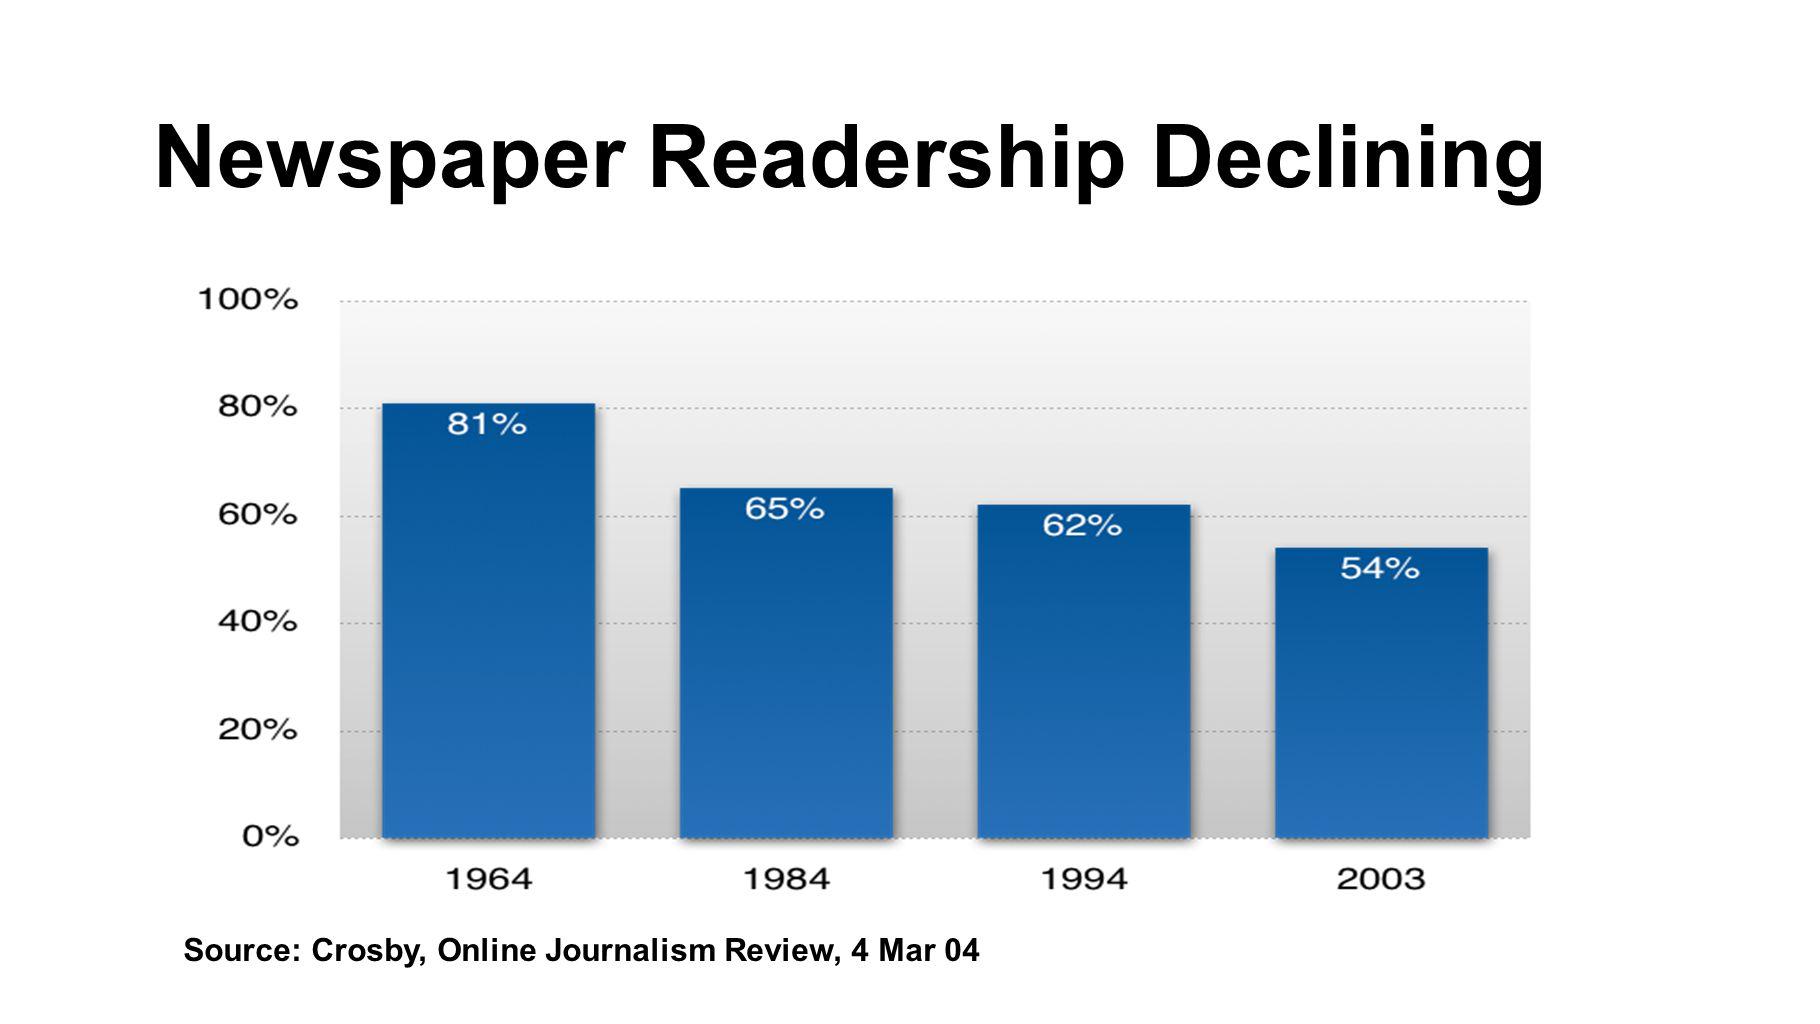 Newspaper Readership Declining Source: Crosby, Online Journalism Review, 4 Mar 04